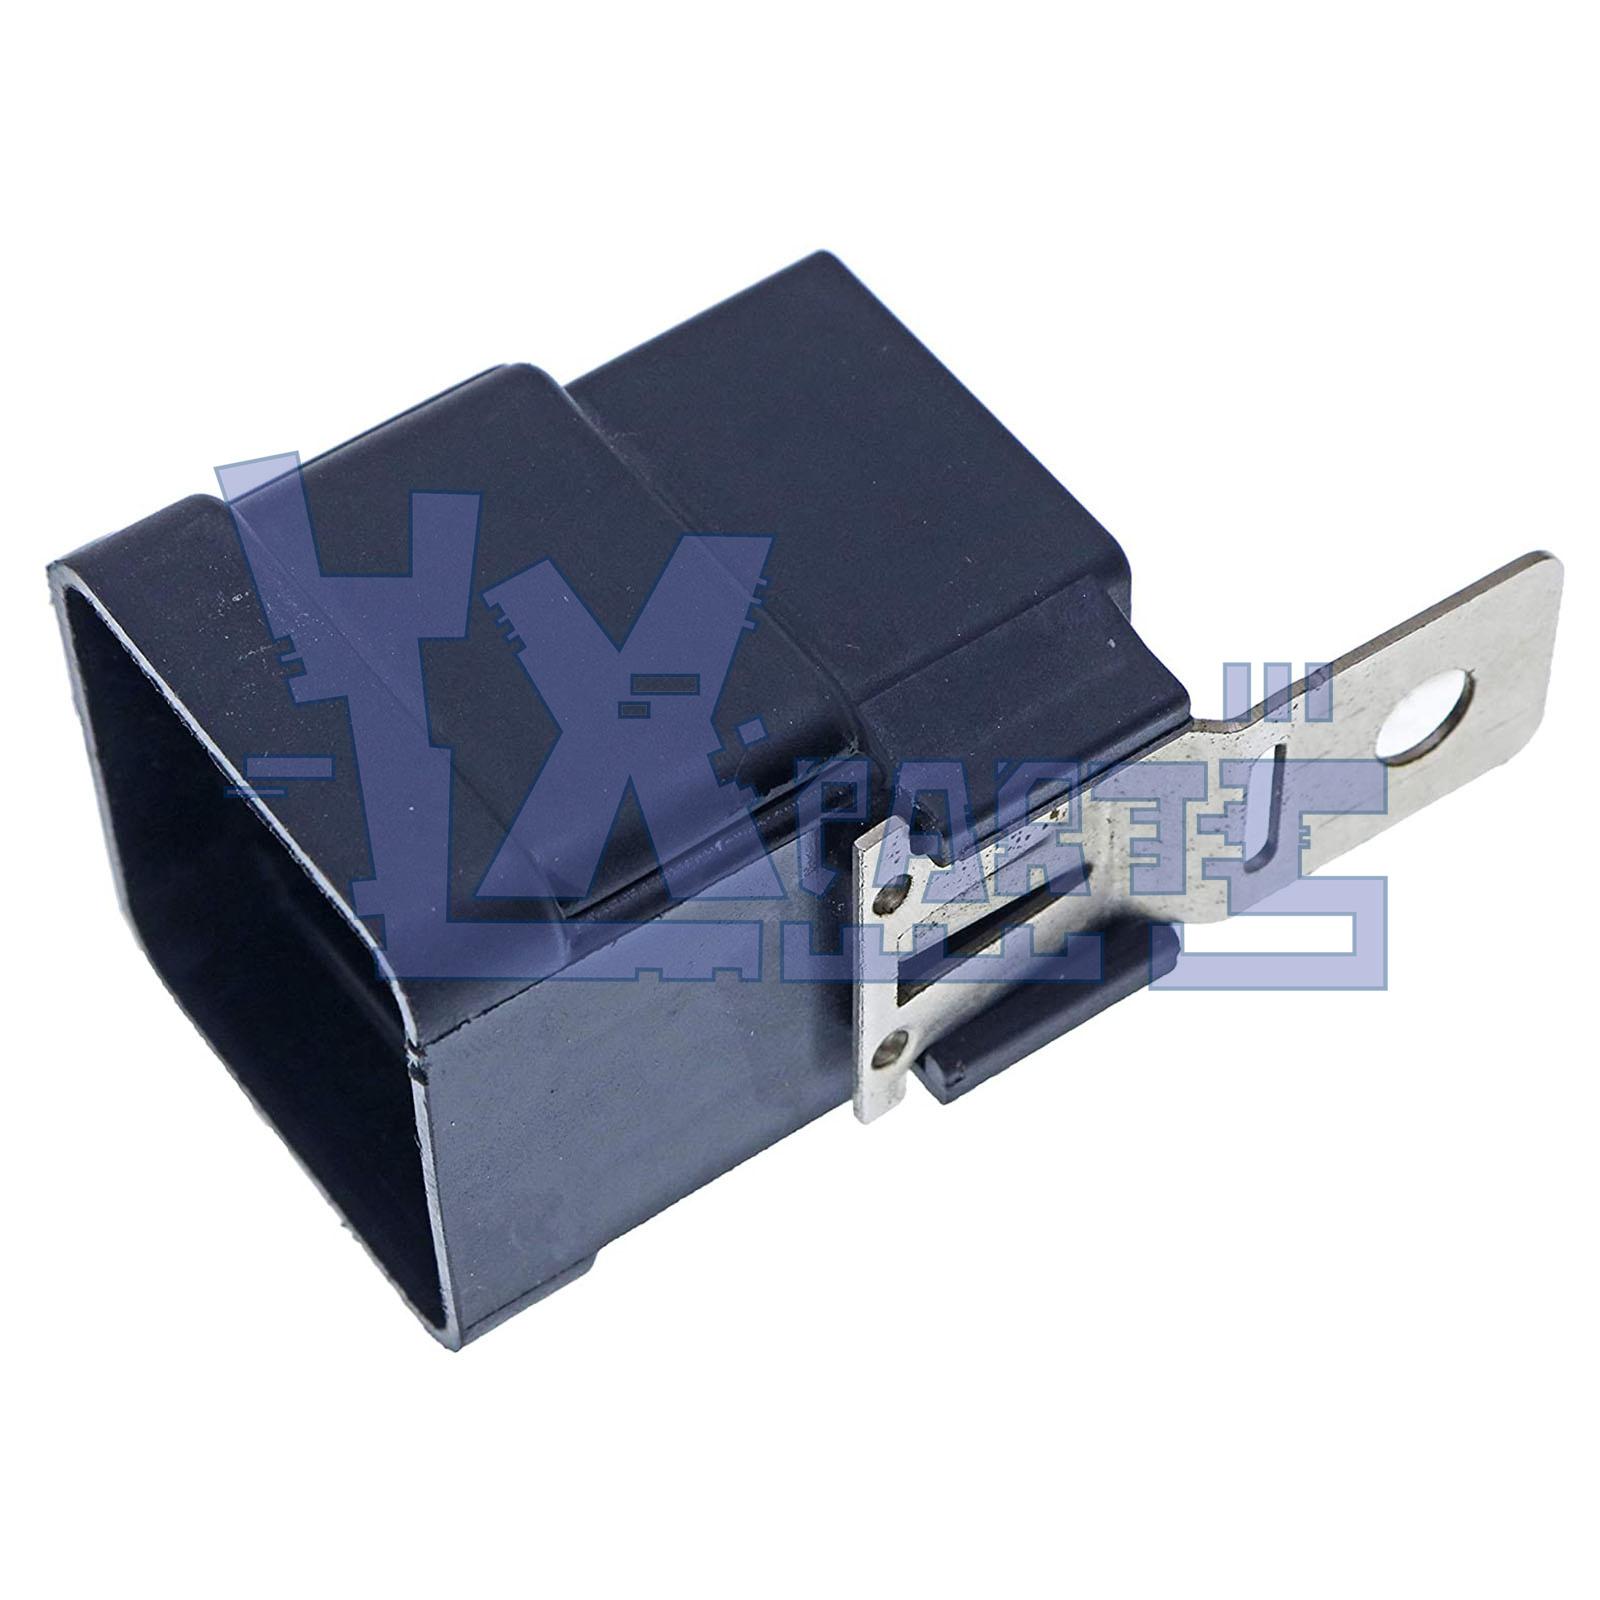 Relay 7219044 for Bobcat A770 S450 S510 S530 S550 S570 S590 S595 S630 S650 S740